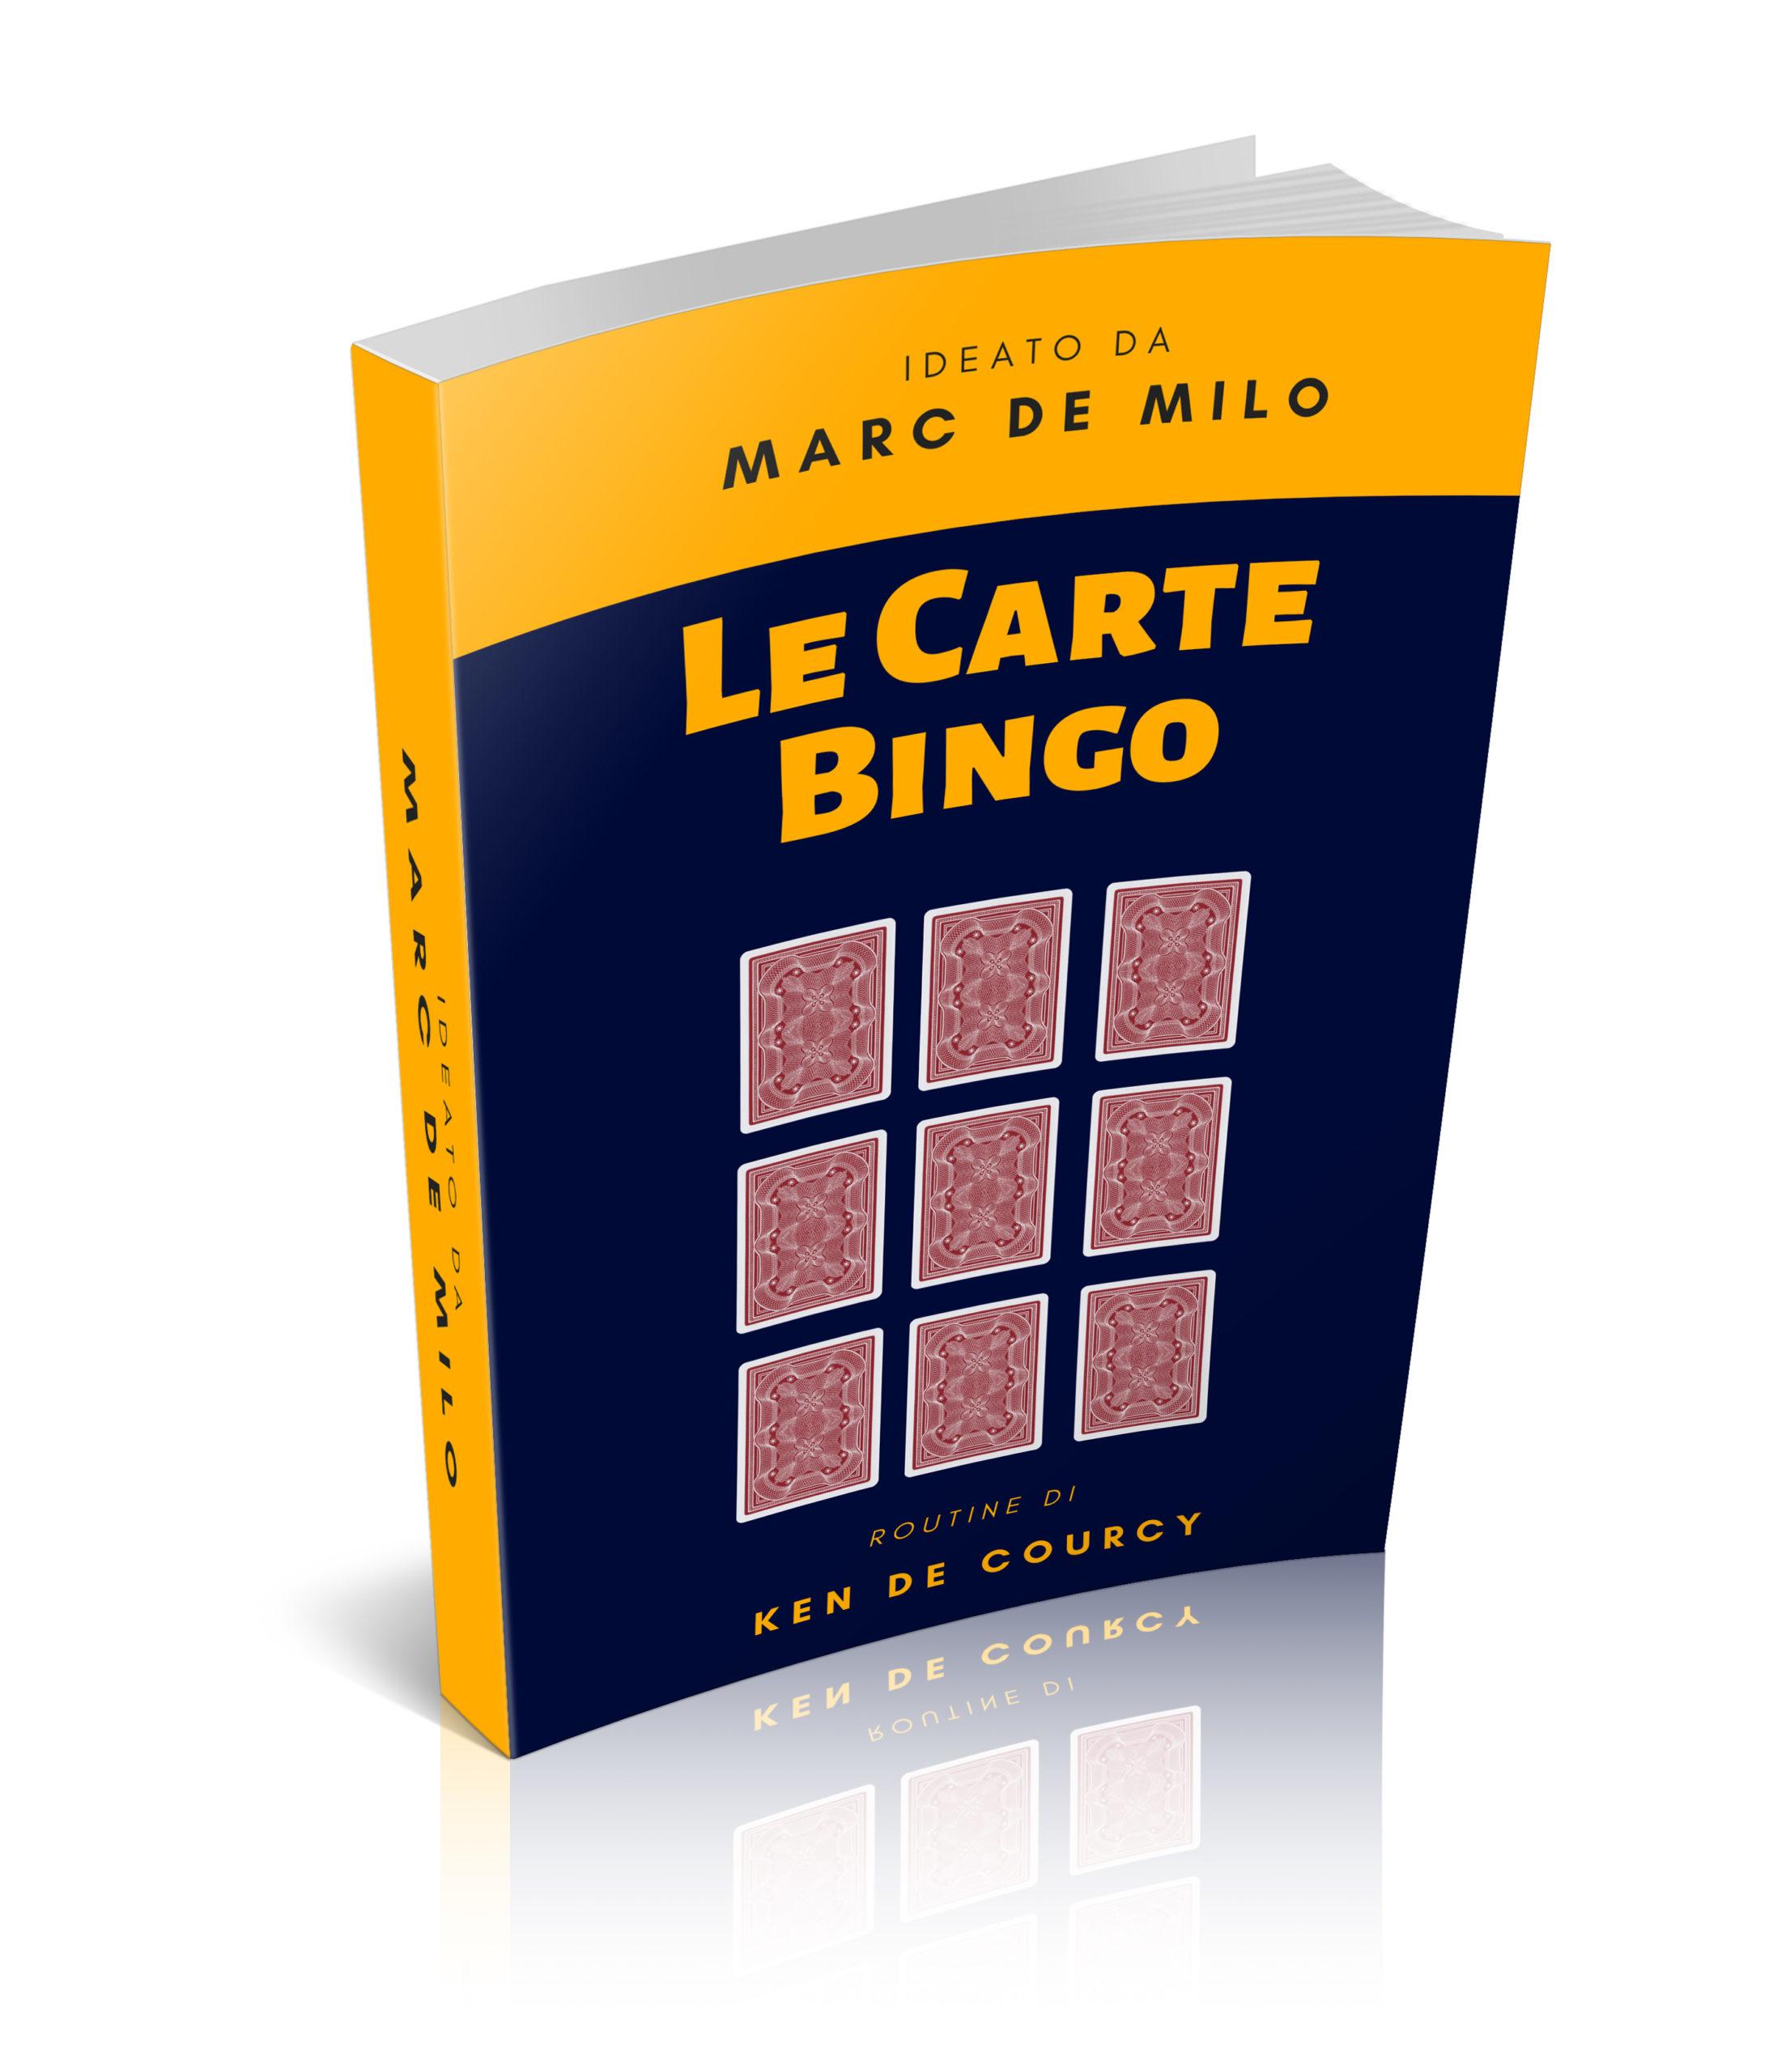 Le Carte Bingo